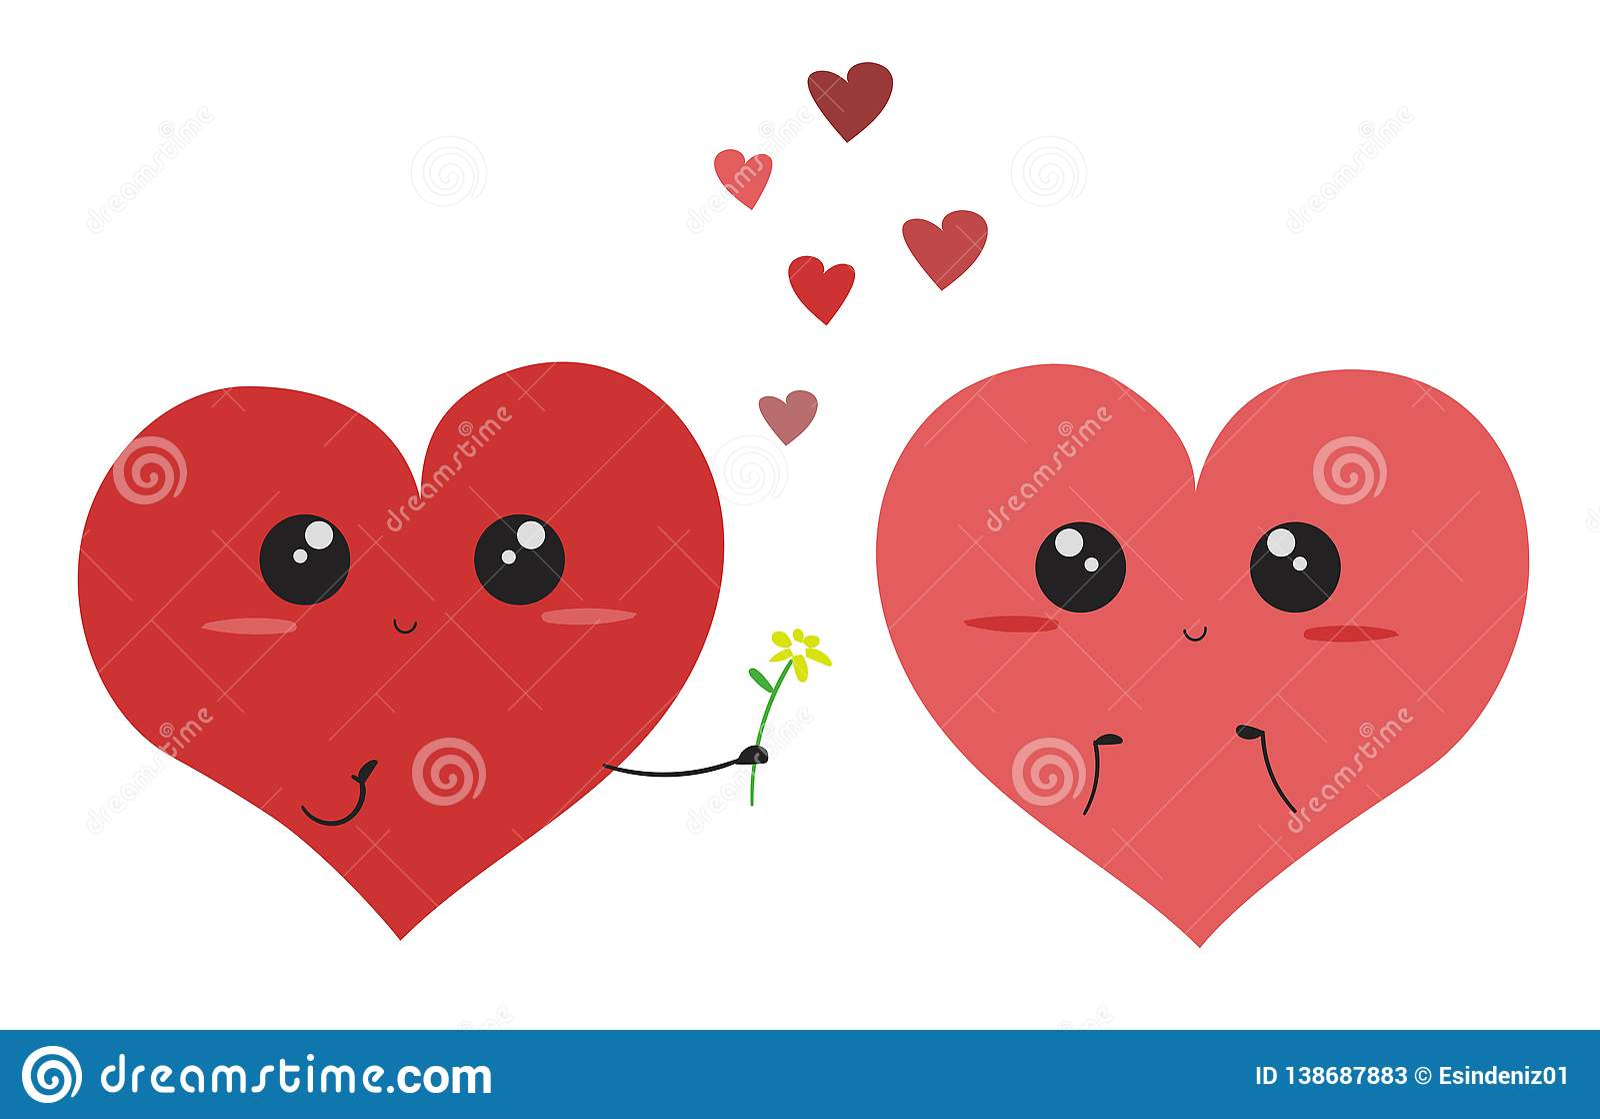 Fun Cheap Heart Figures Background Wallpaper Valentines